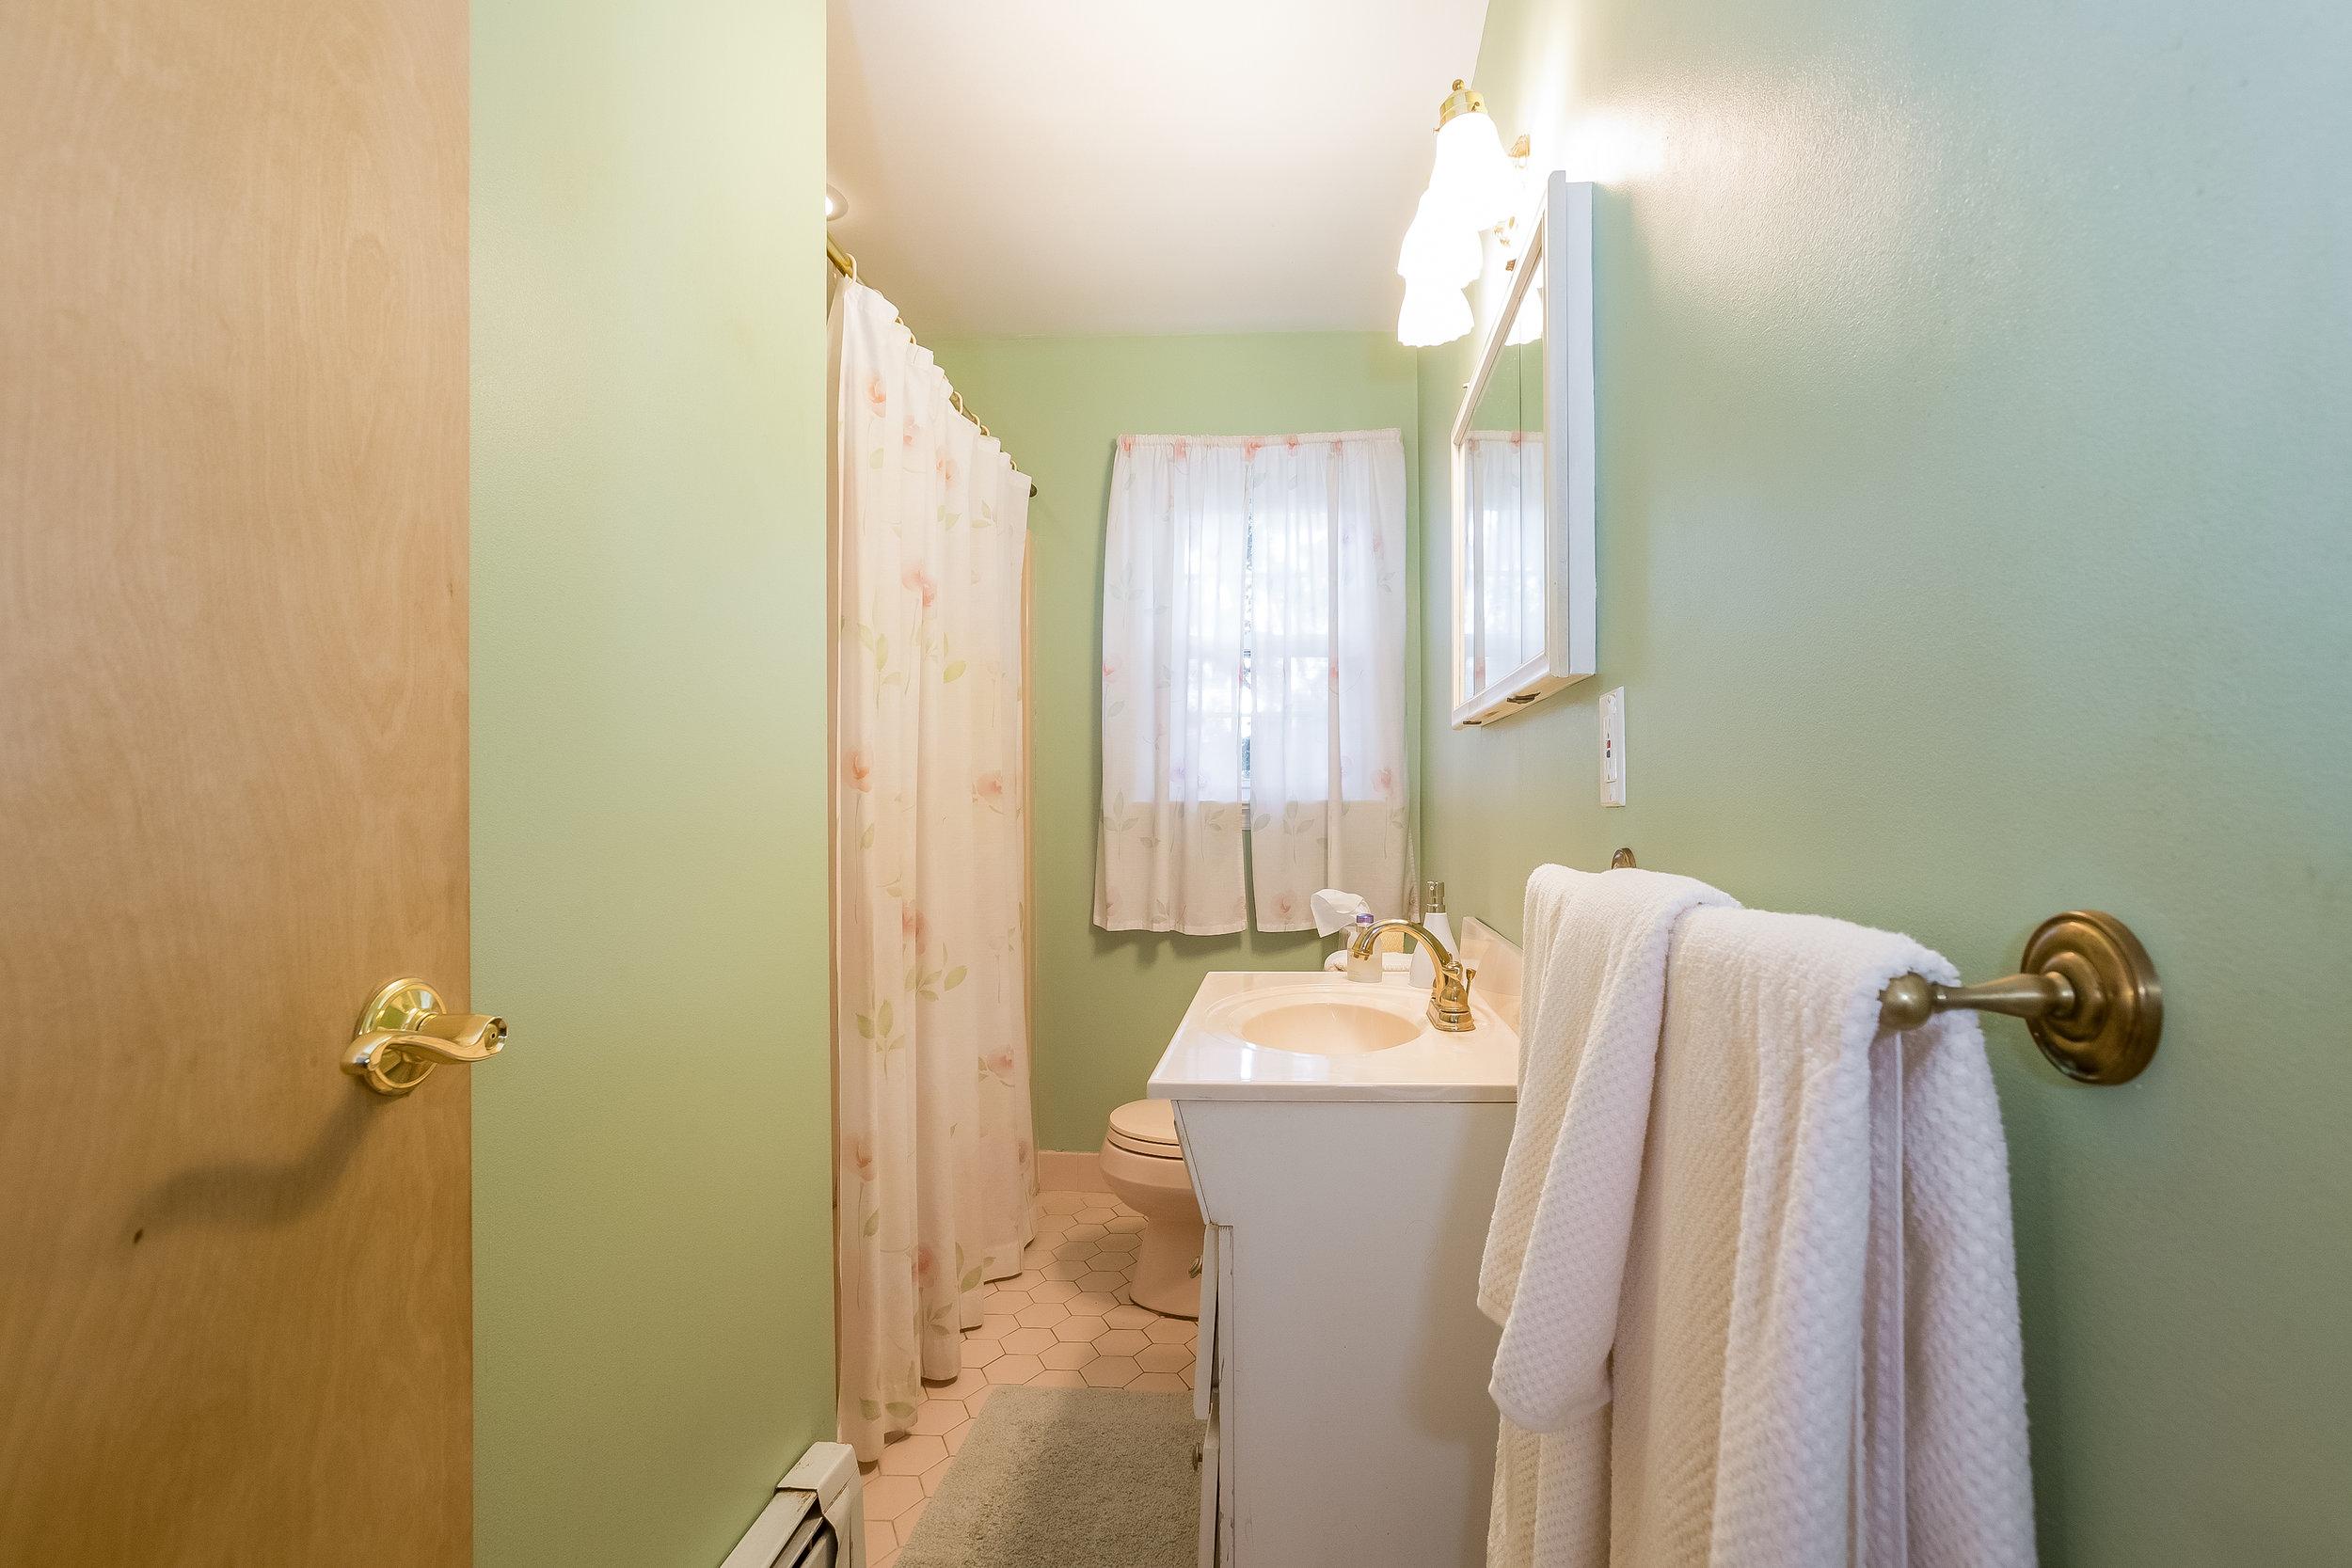 025-Bathroom-5002149-large.jpg